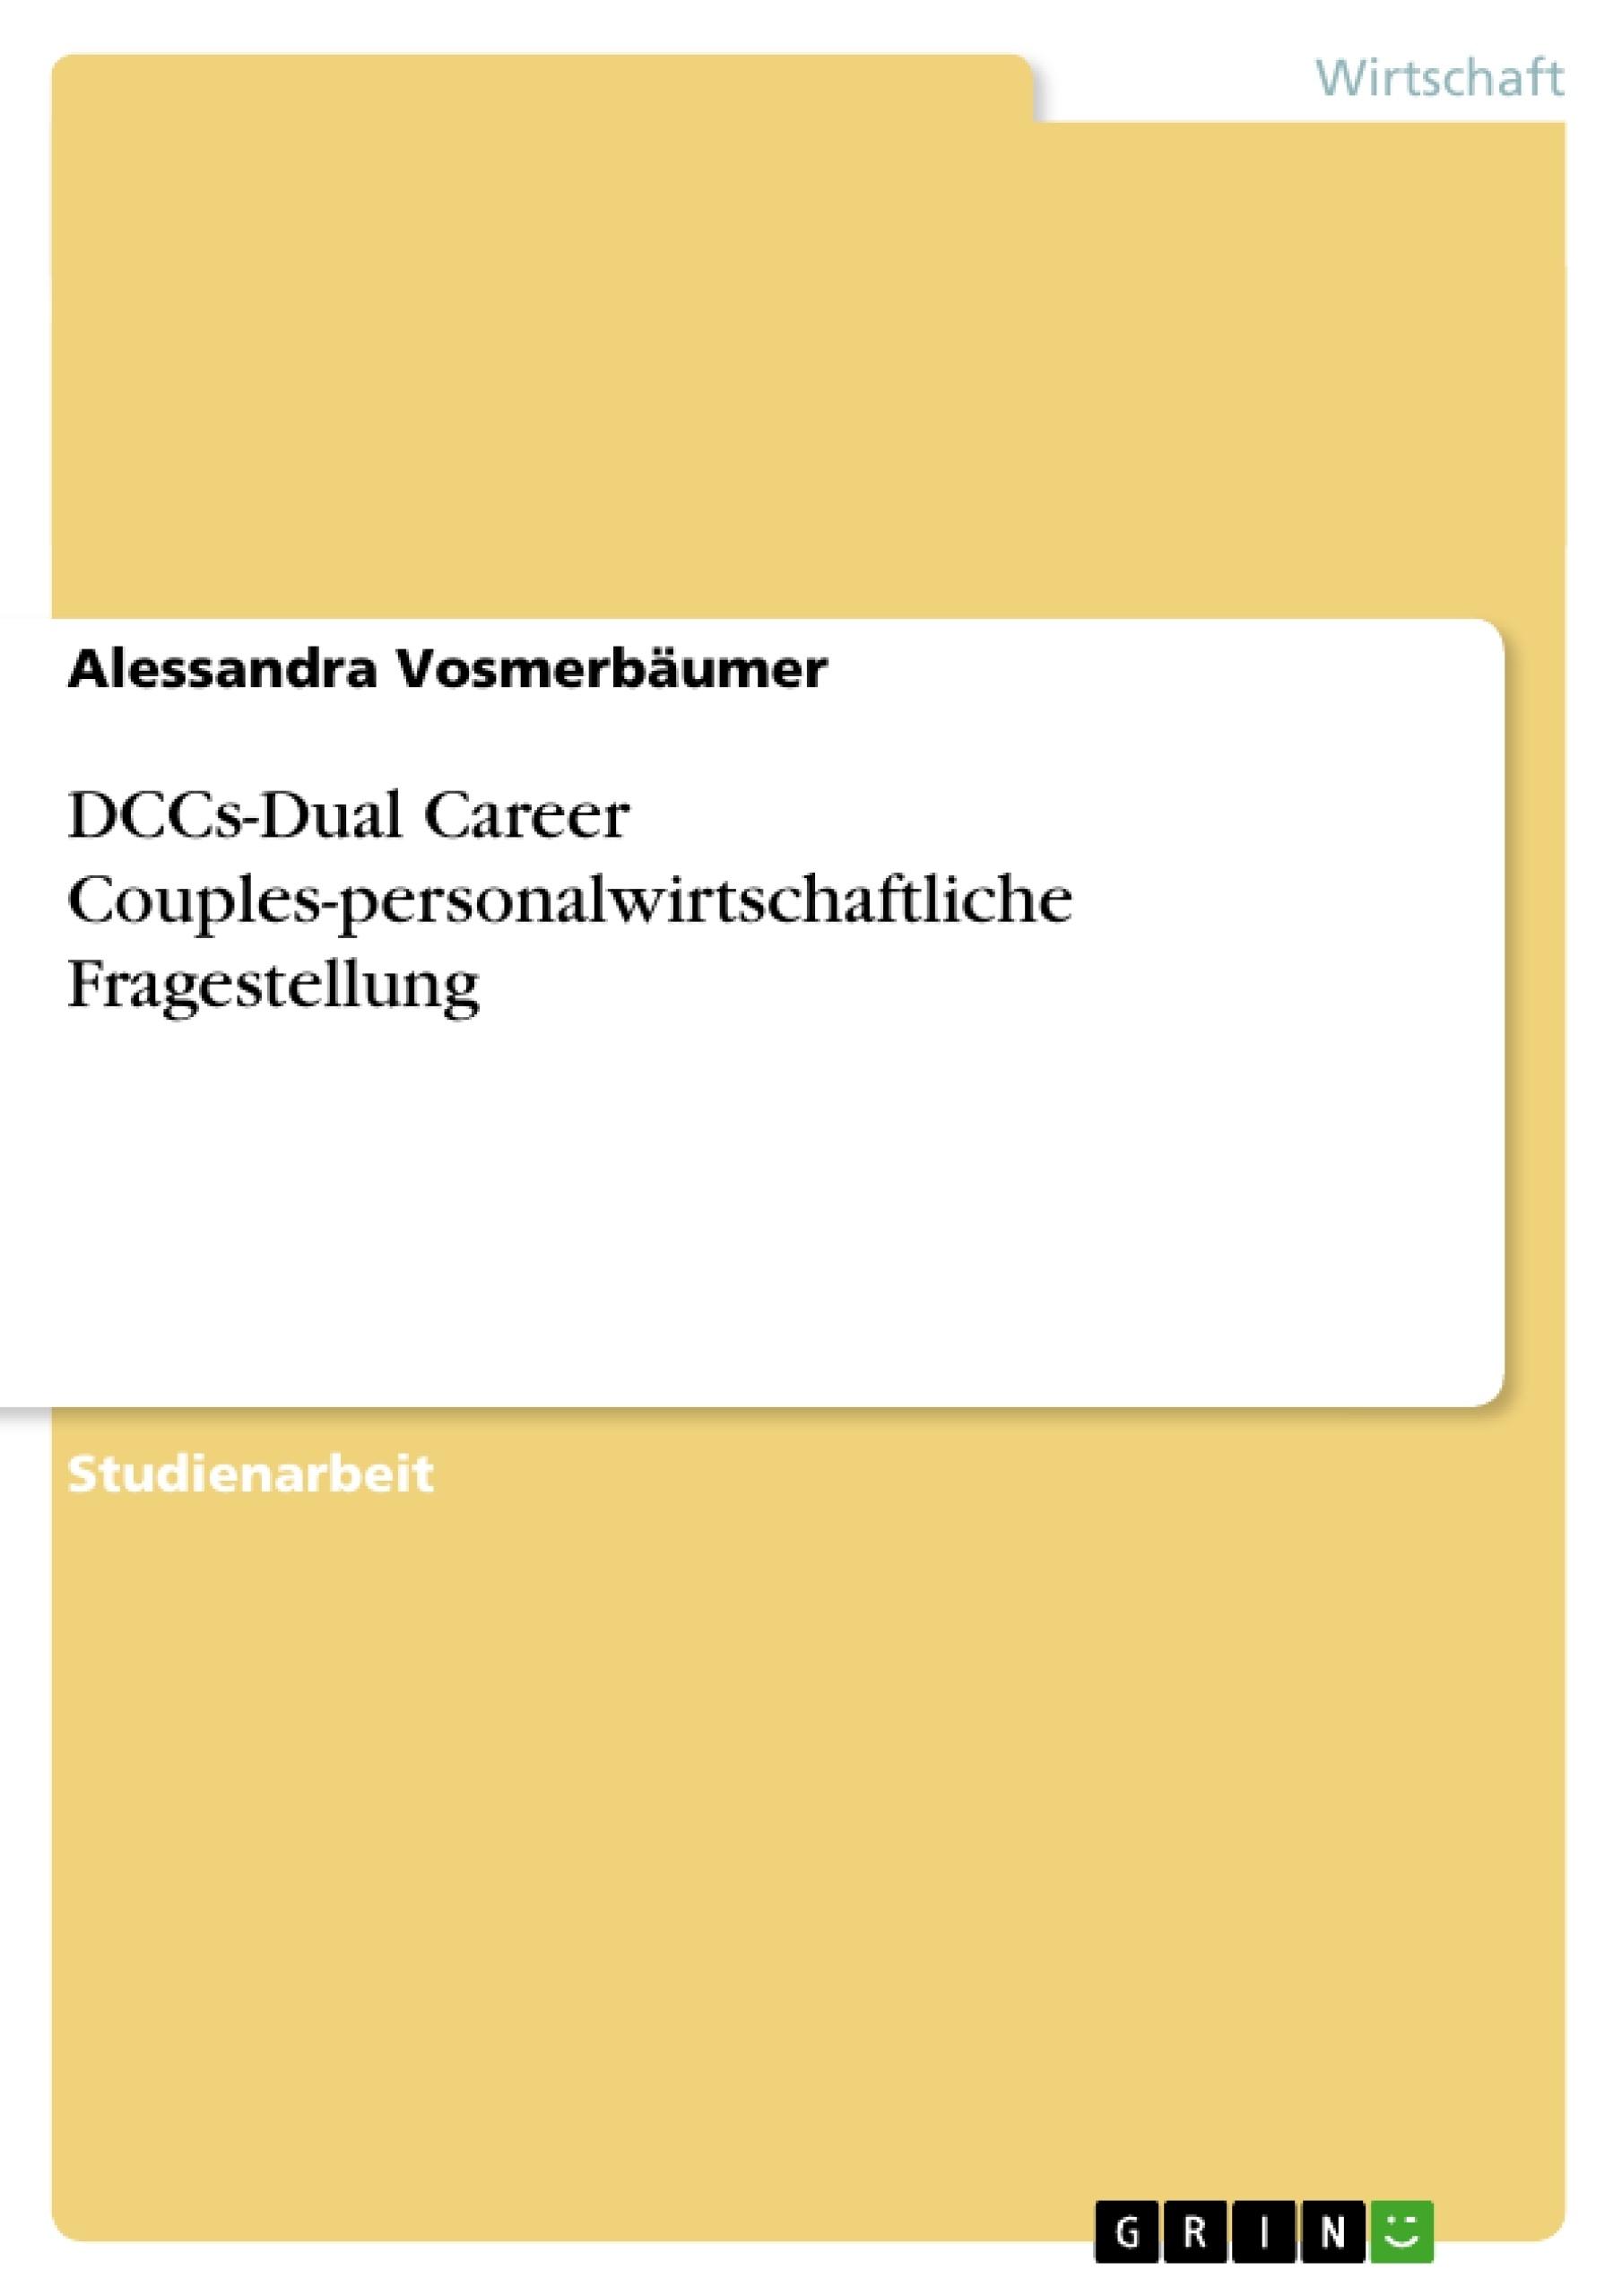 Titel: DCCs-Dual Career Couples-personalwirtschaftliche Fragestellung